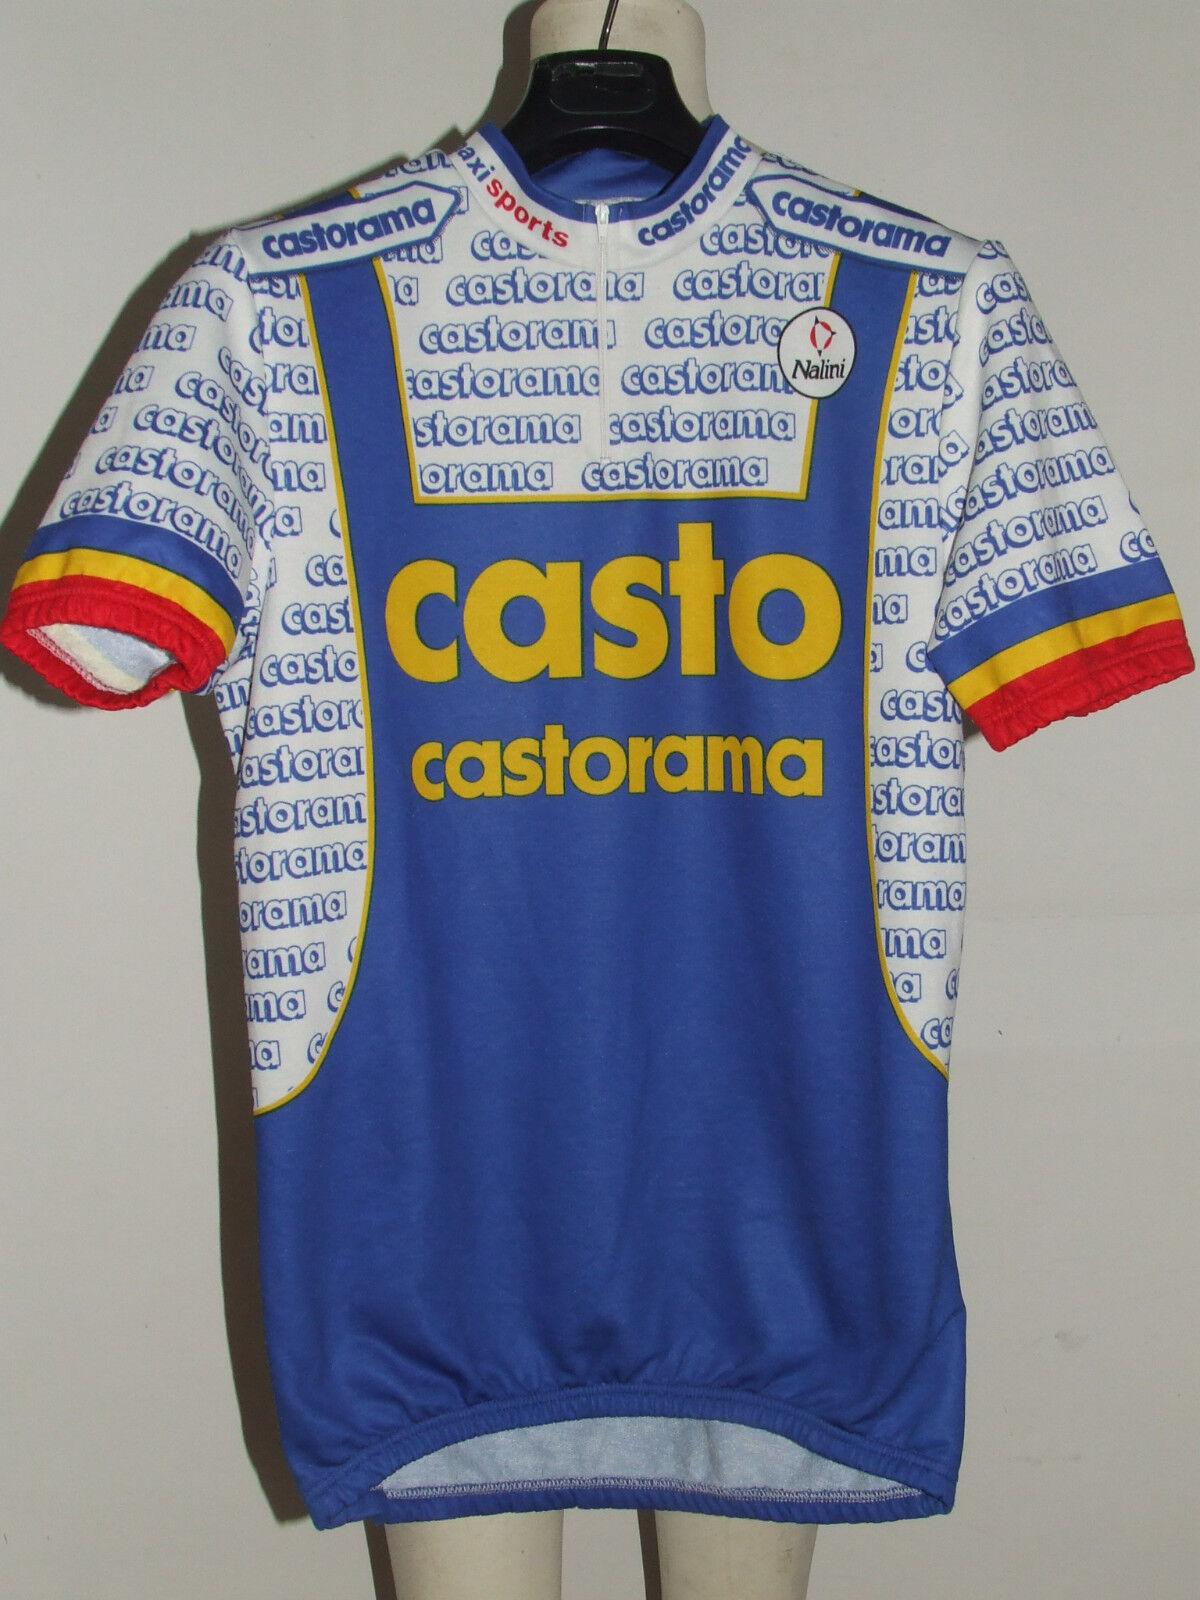 MAGLIA BICI CICLISMO  SHIRT MAILLOT CYCLISM TEAM CASTO CASTORAMA NALINI tg. XXL  factory direct and quick delivery